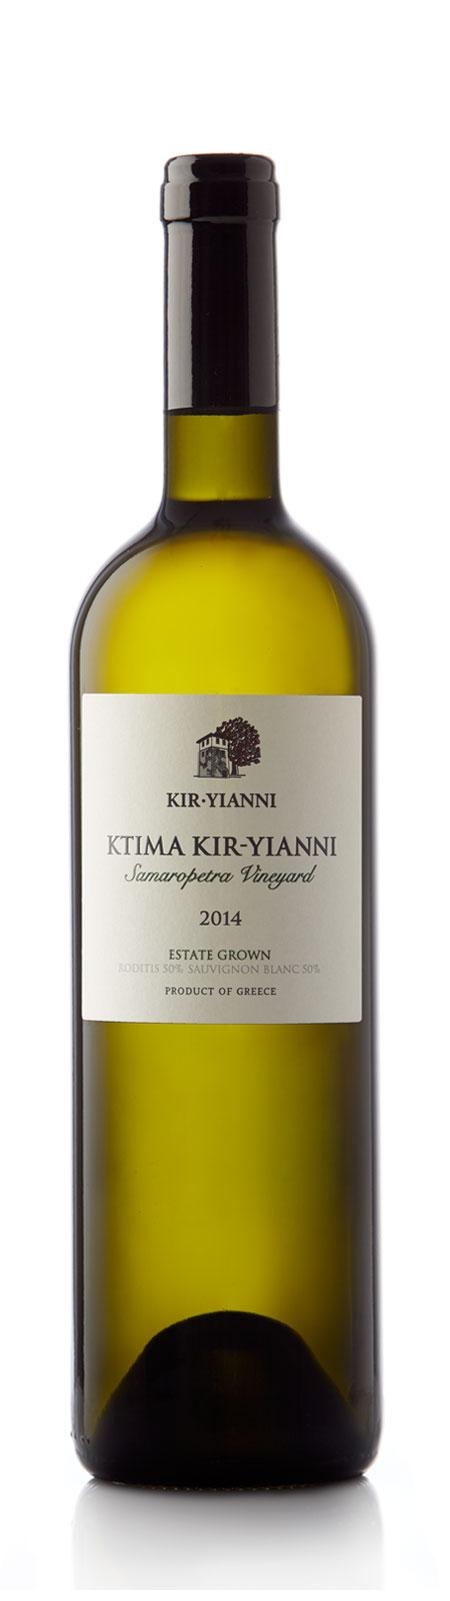 Ktima Kir-Yianni Samaropetra Vineyard